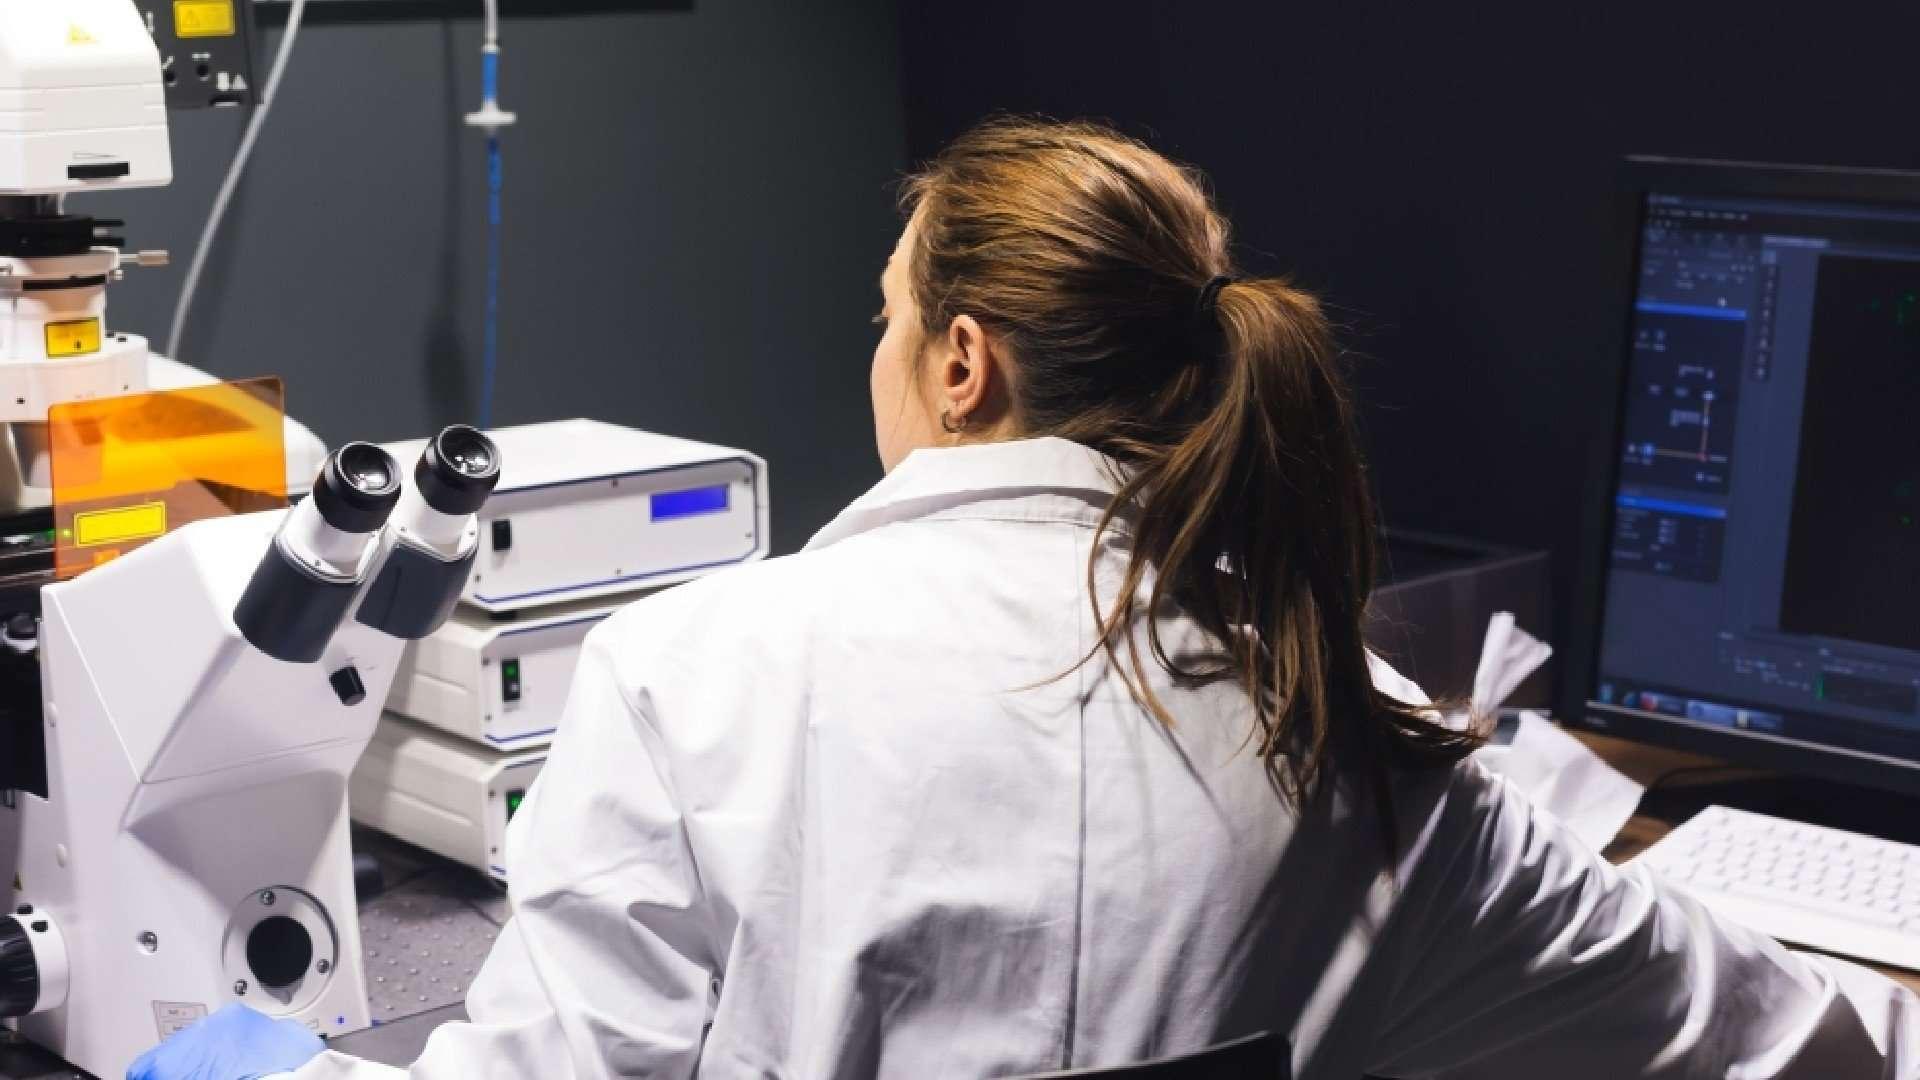 Health Scientist staring at scientific equipment